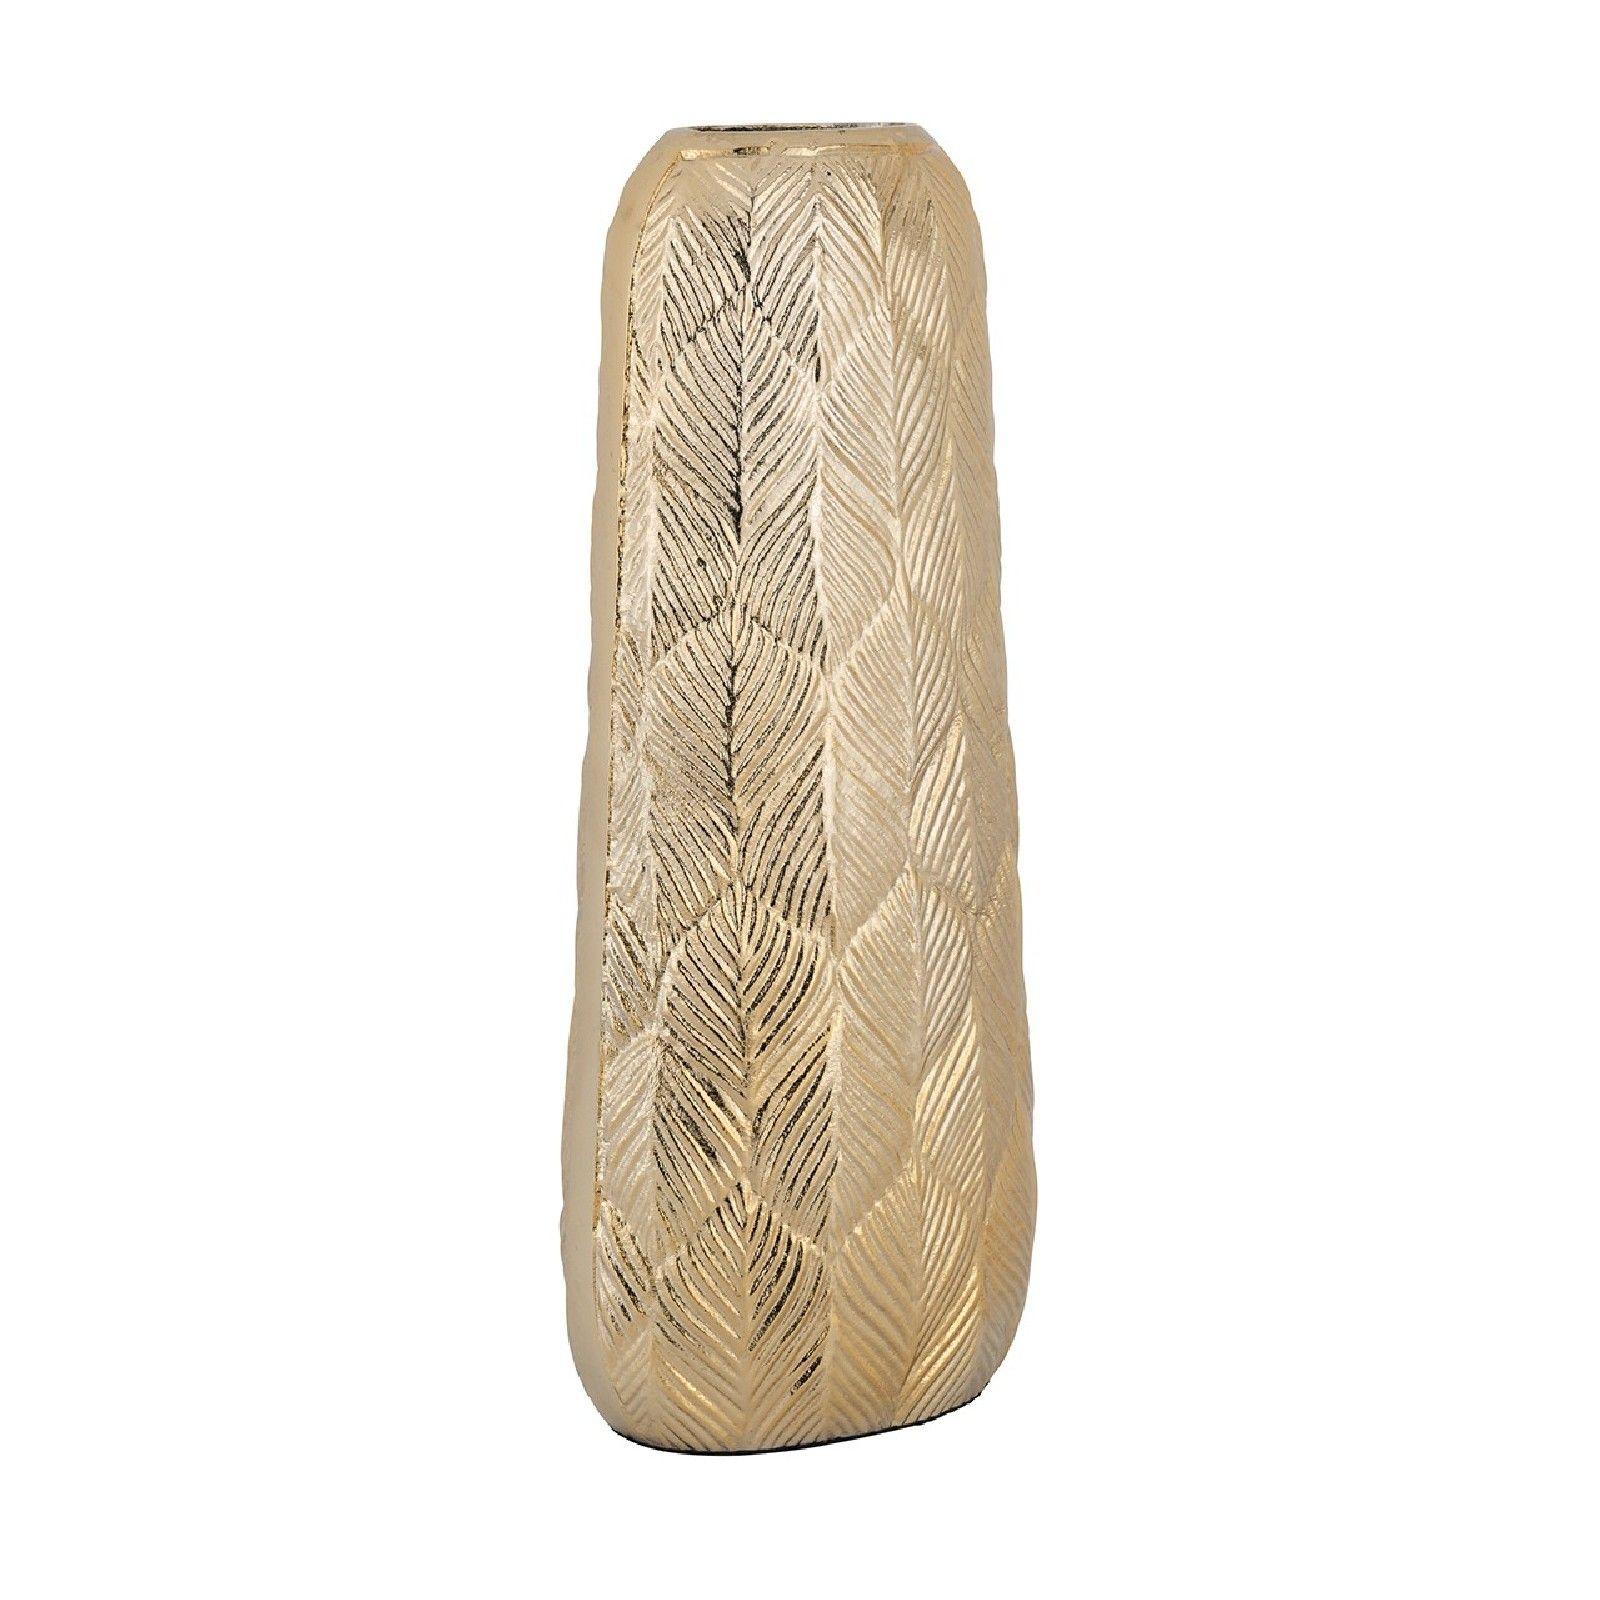 Vase Kyan gold small Vases - 1